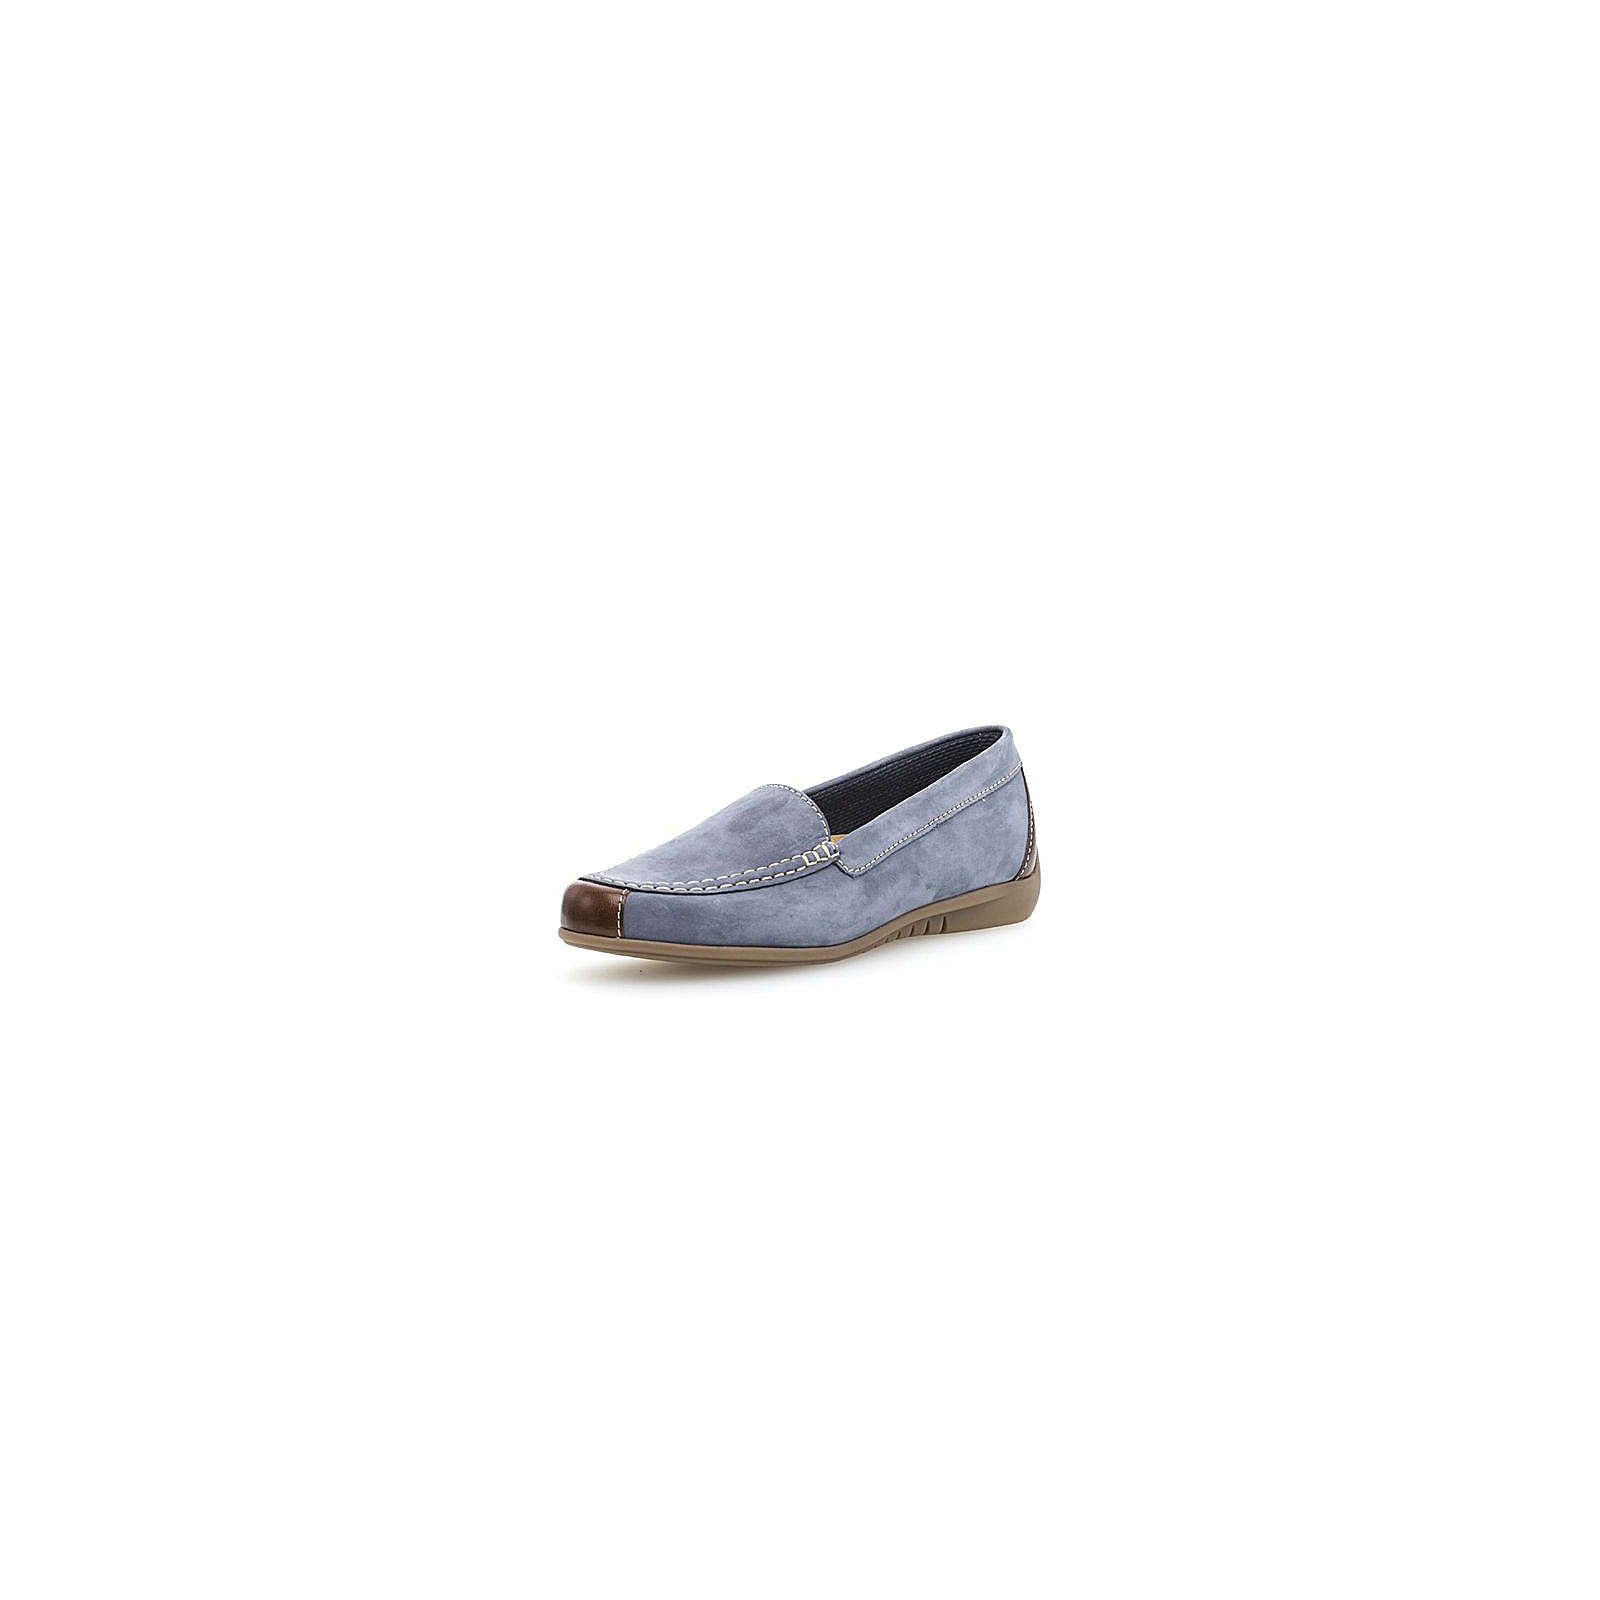 gabor klassische slipper blau damen gr 38. Black Bedroom Furniture Sets. Home Design Ideas